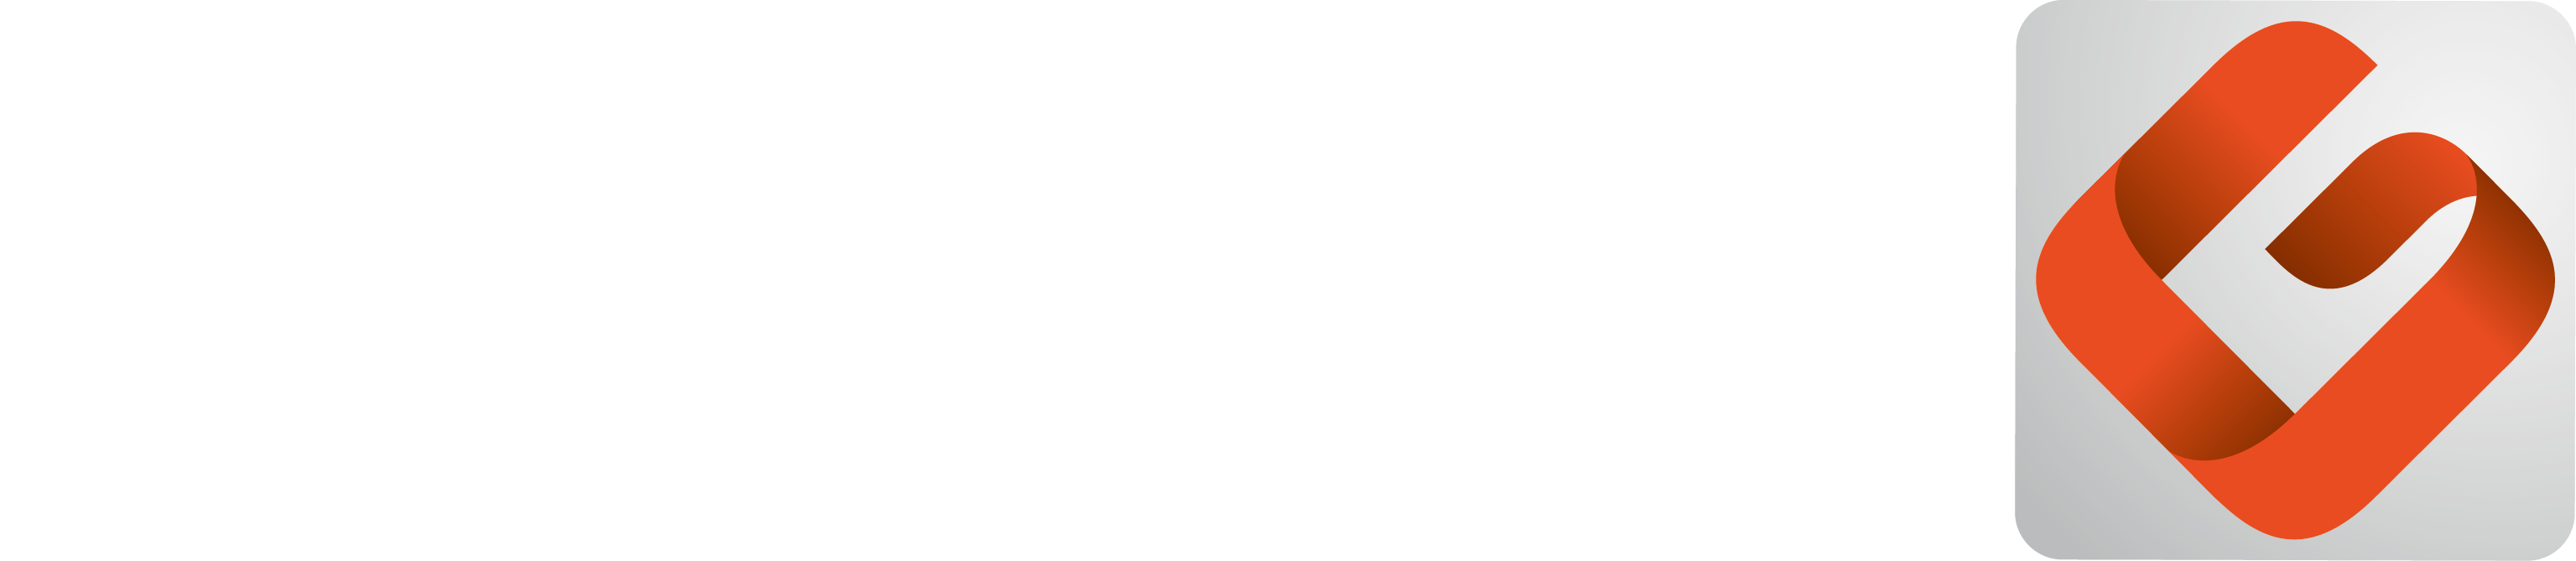 Logo Gamystem italia